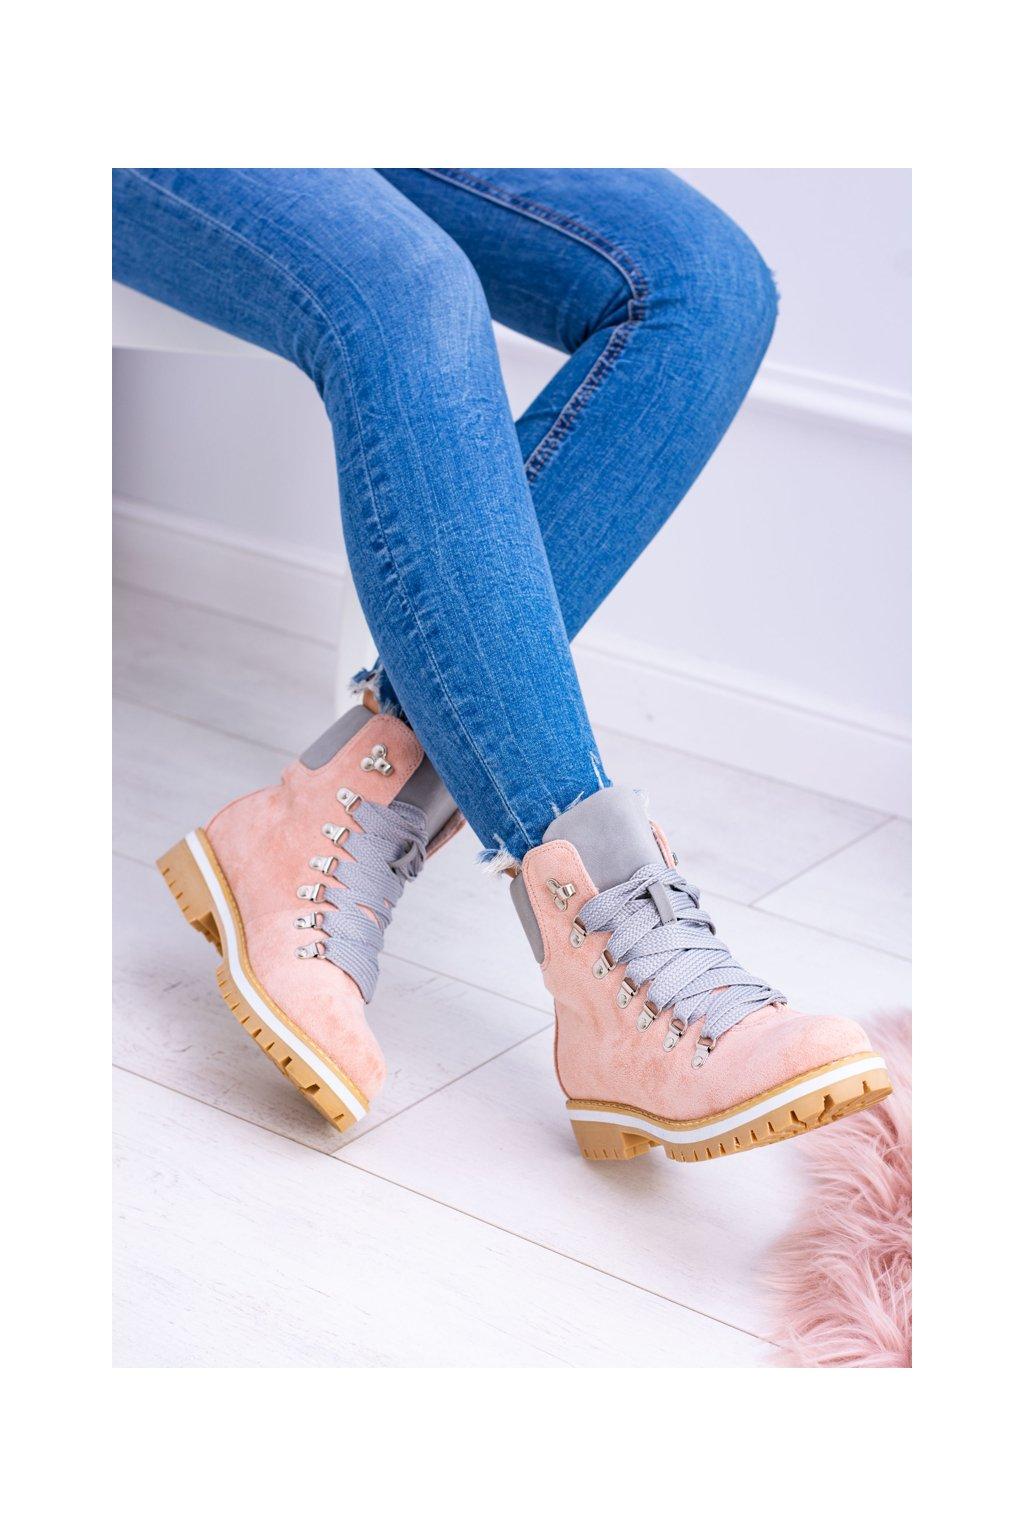 Ružové Dámske členkové topánky Vices K2